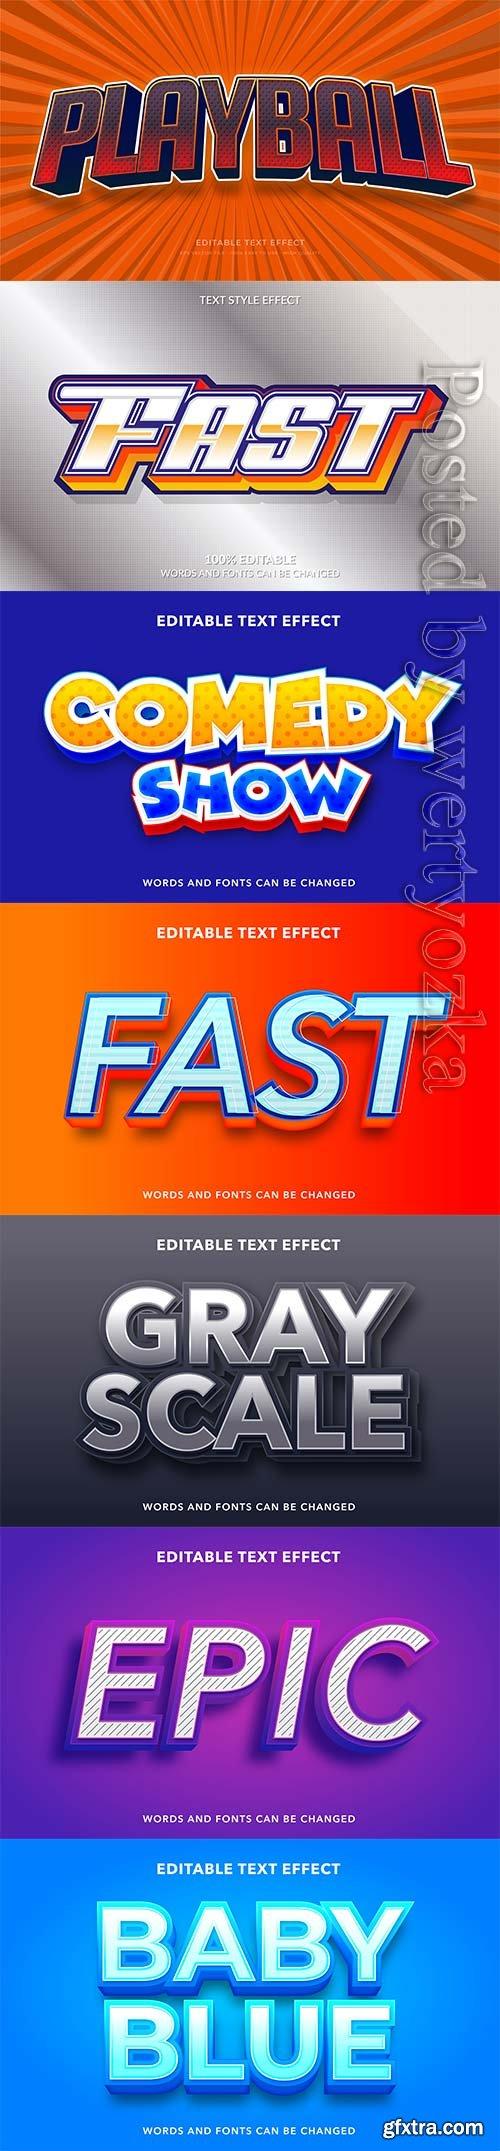 3d editable text style effect vector vol 248